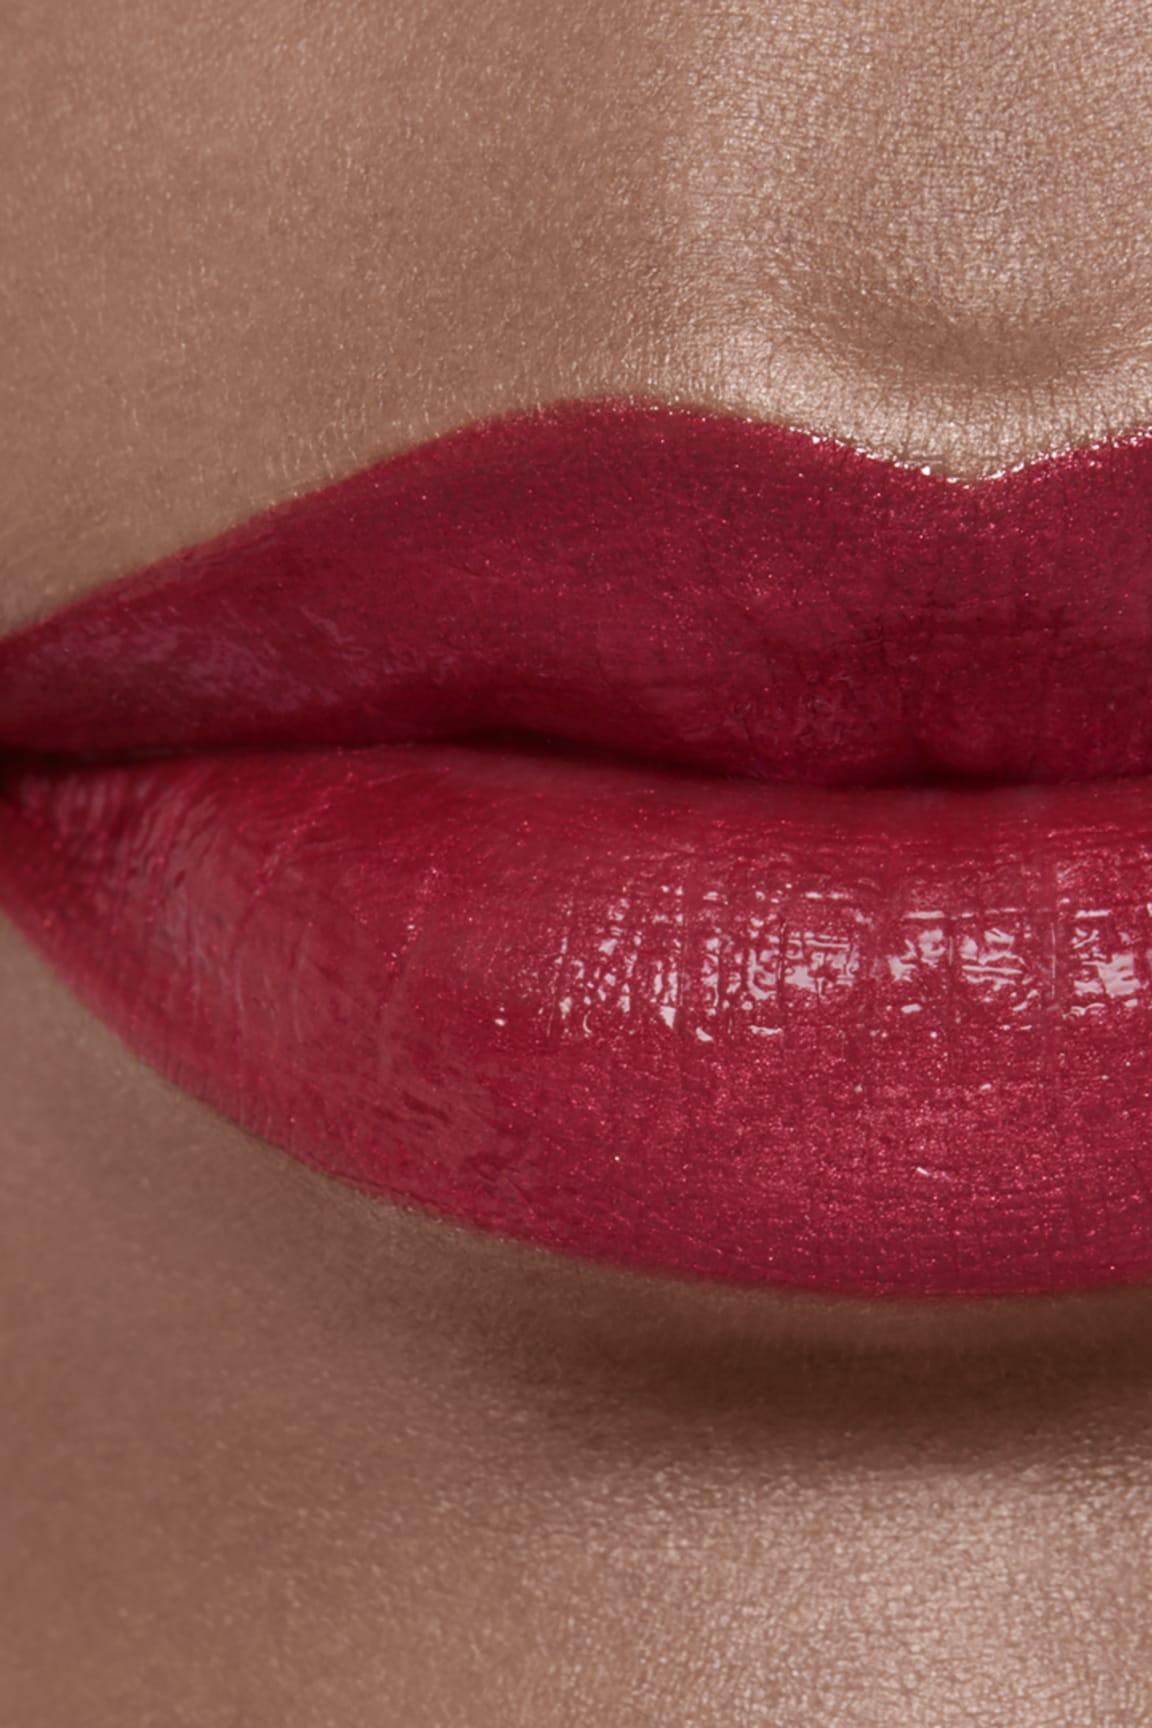 Anwendung Make-up-Bild 2 - ROUGE COCO BLOOM 142 - BURST